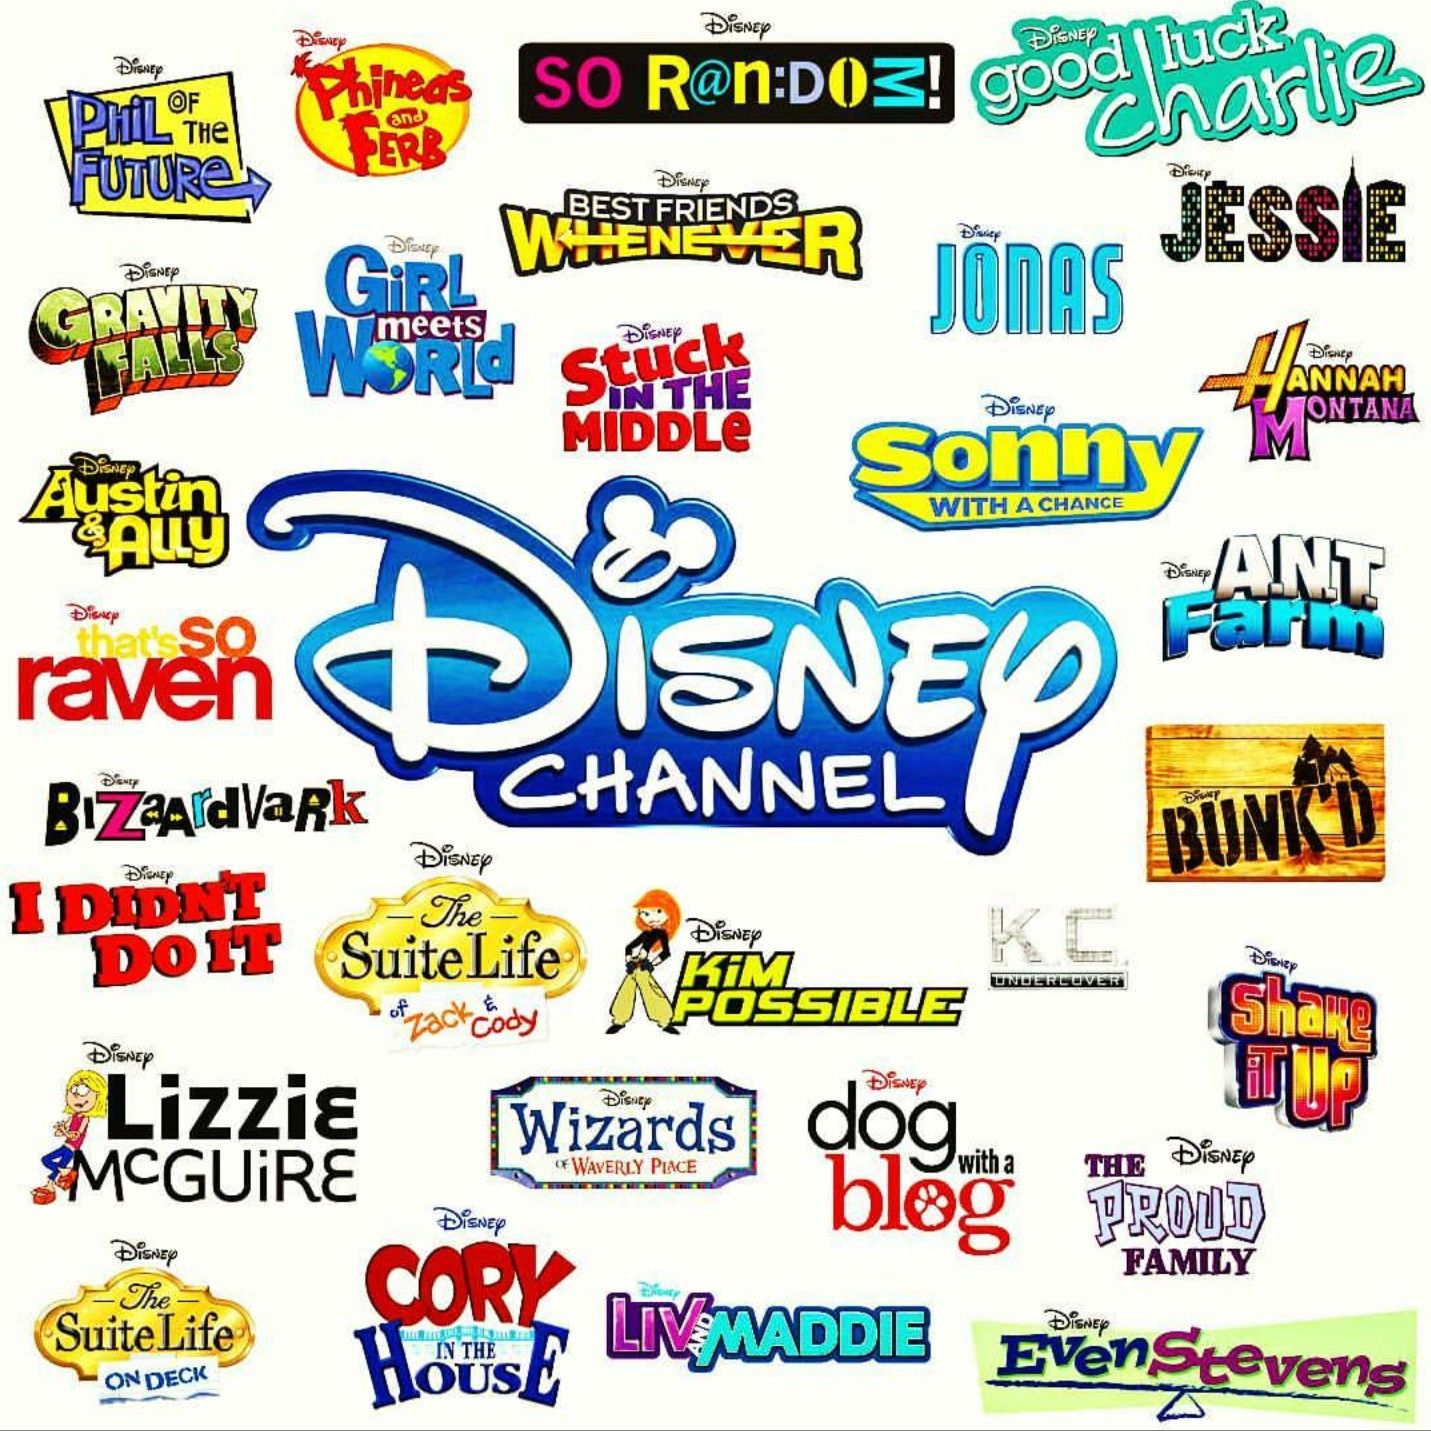 Disney Channel Logos Disney channel shows, Disney